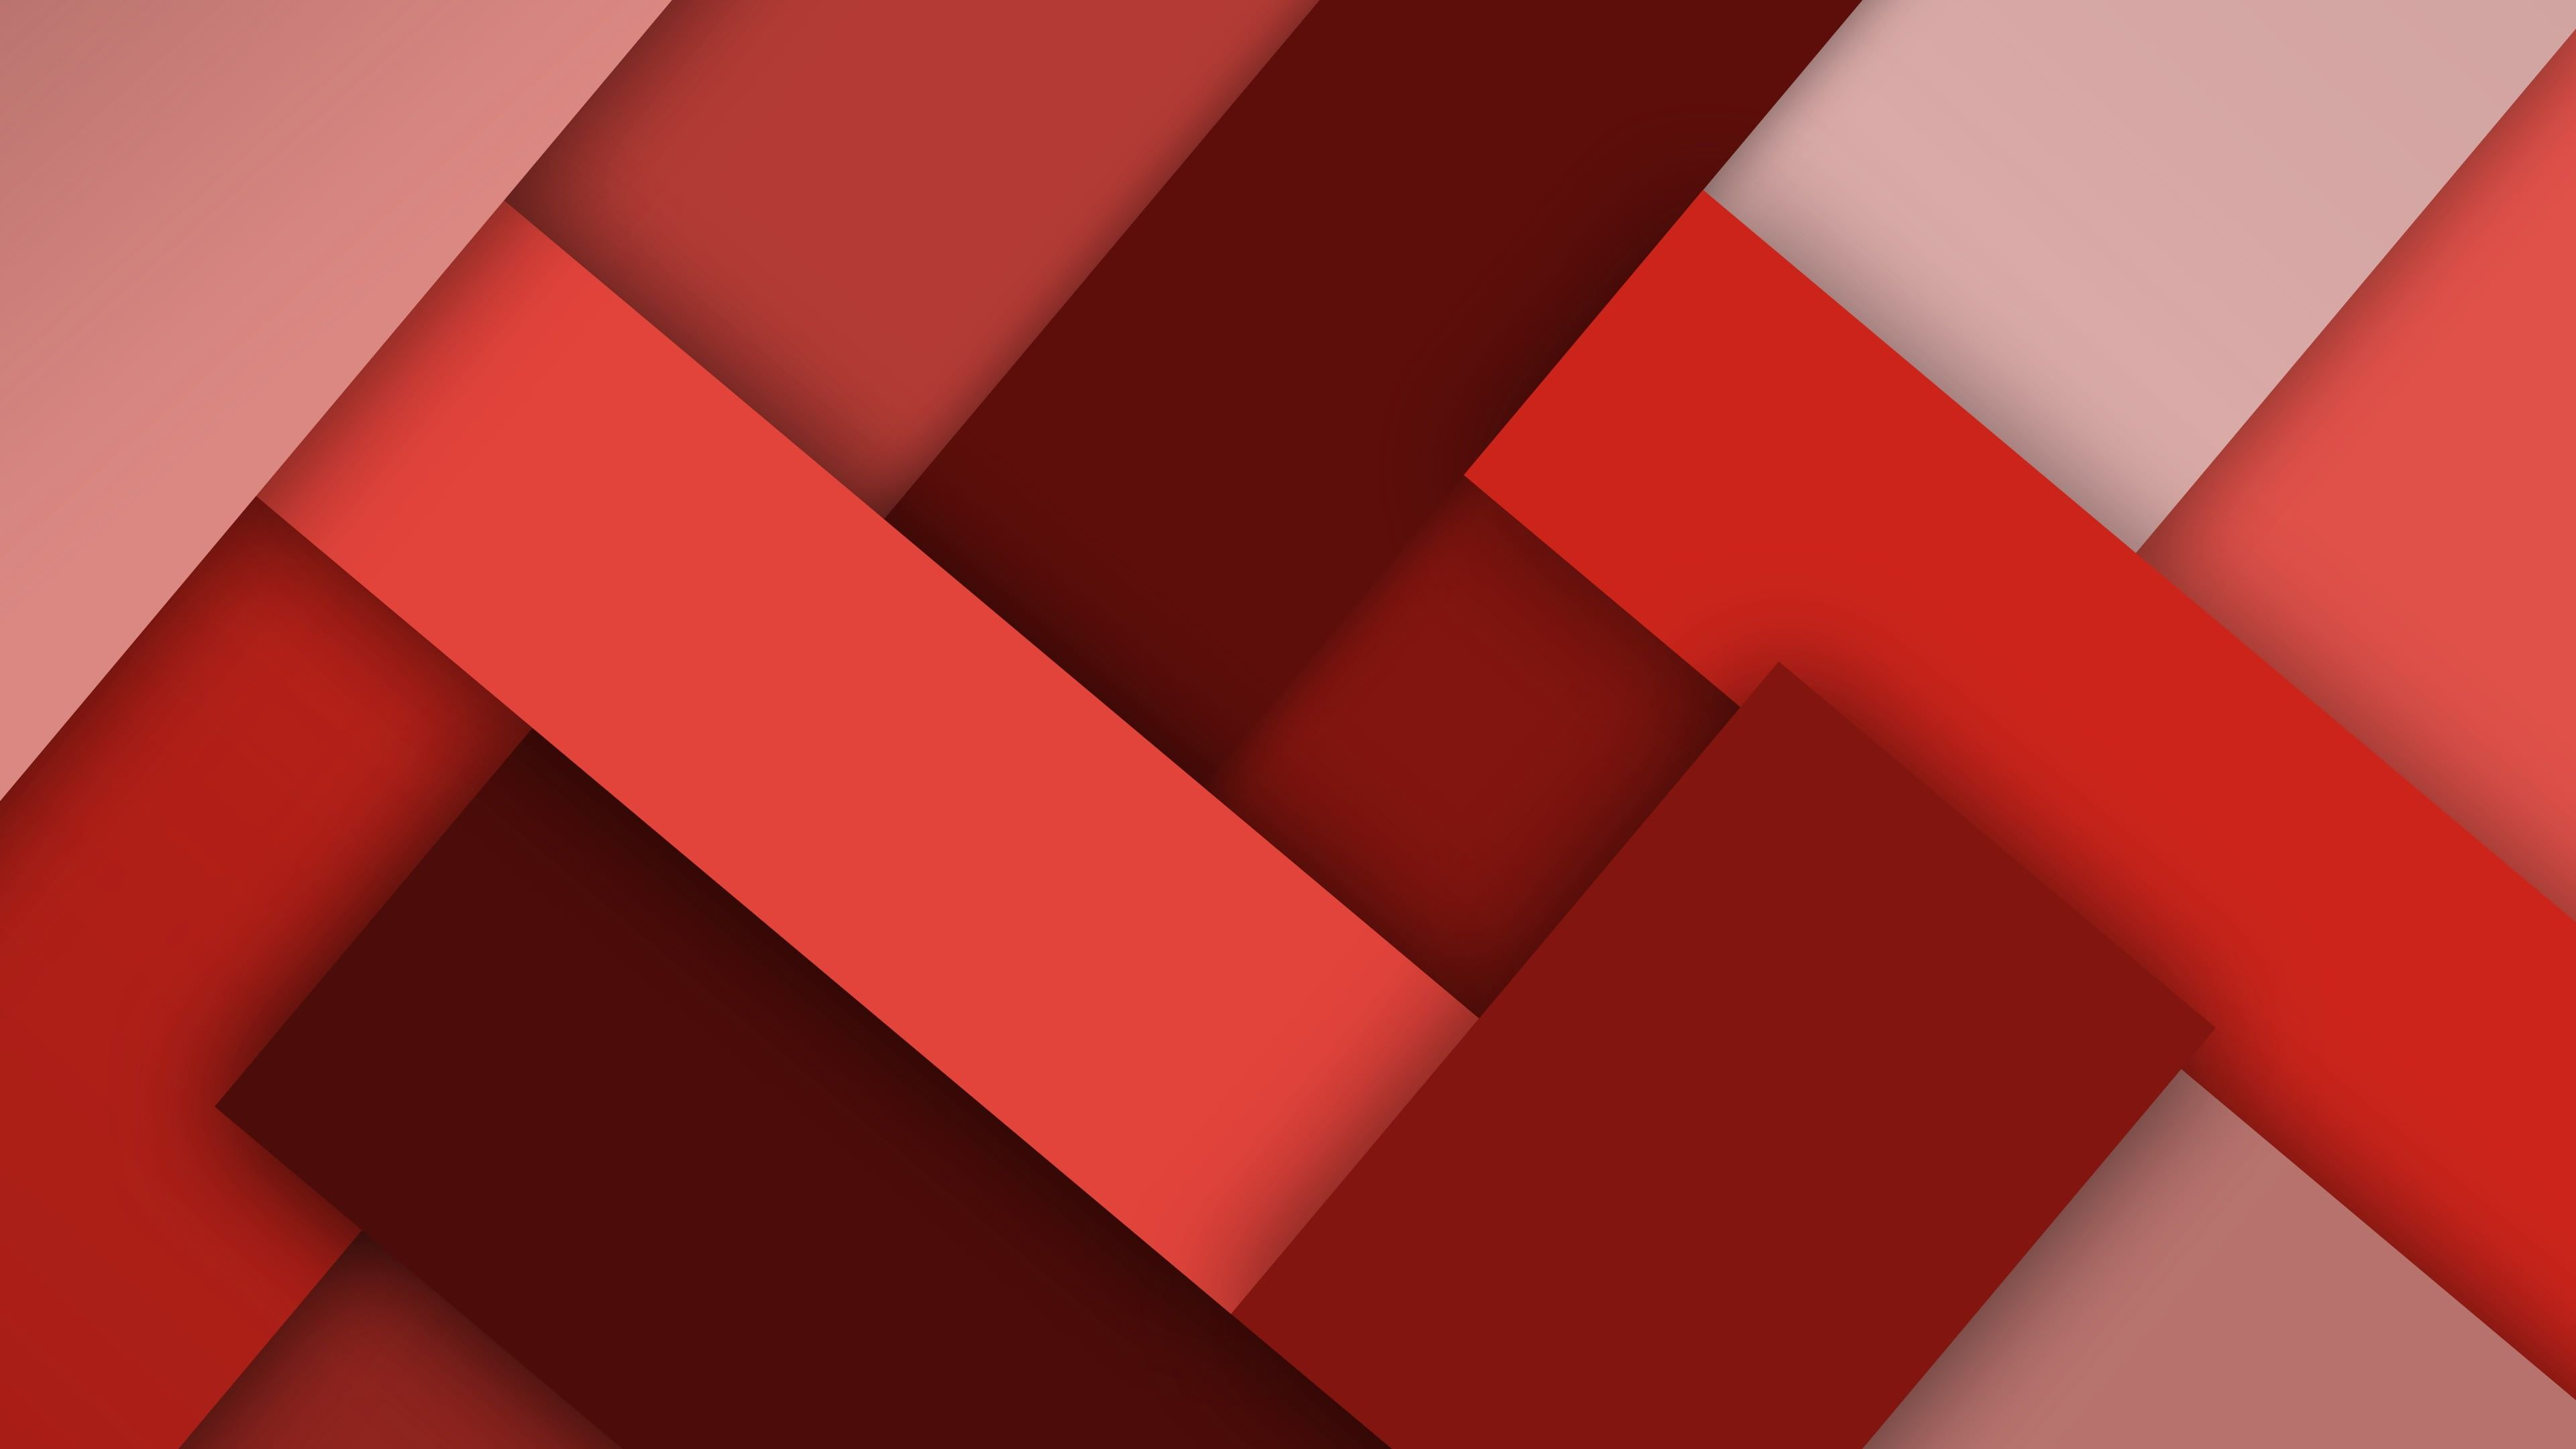 Red And White Wallpaper Minimalism Digital Art Simple 4k Wallpaper Hdwallpaper Desktop Red And White Wallpaper Abstract Wallpaper